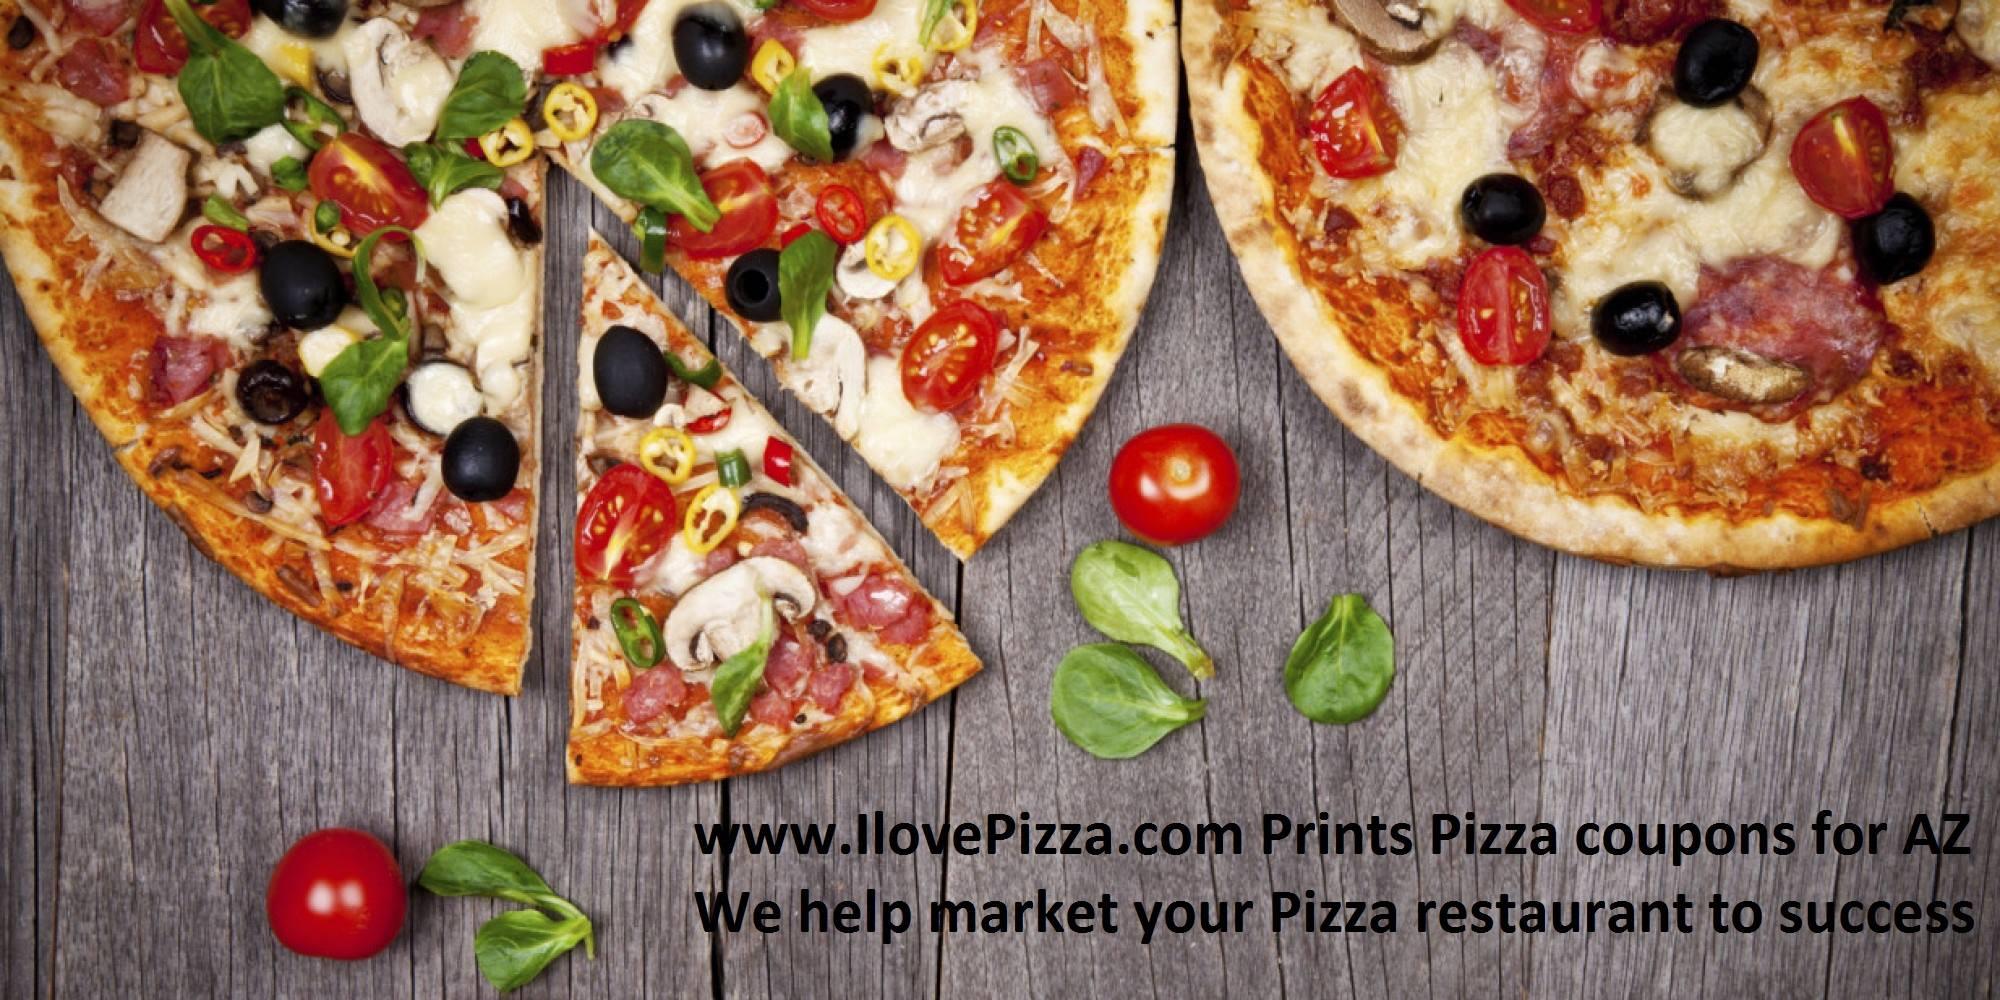 Pizza restaurant in Phoenix,Italian restaurant in Phoenix. www.iLovePizzas.com